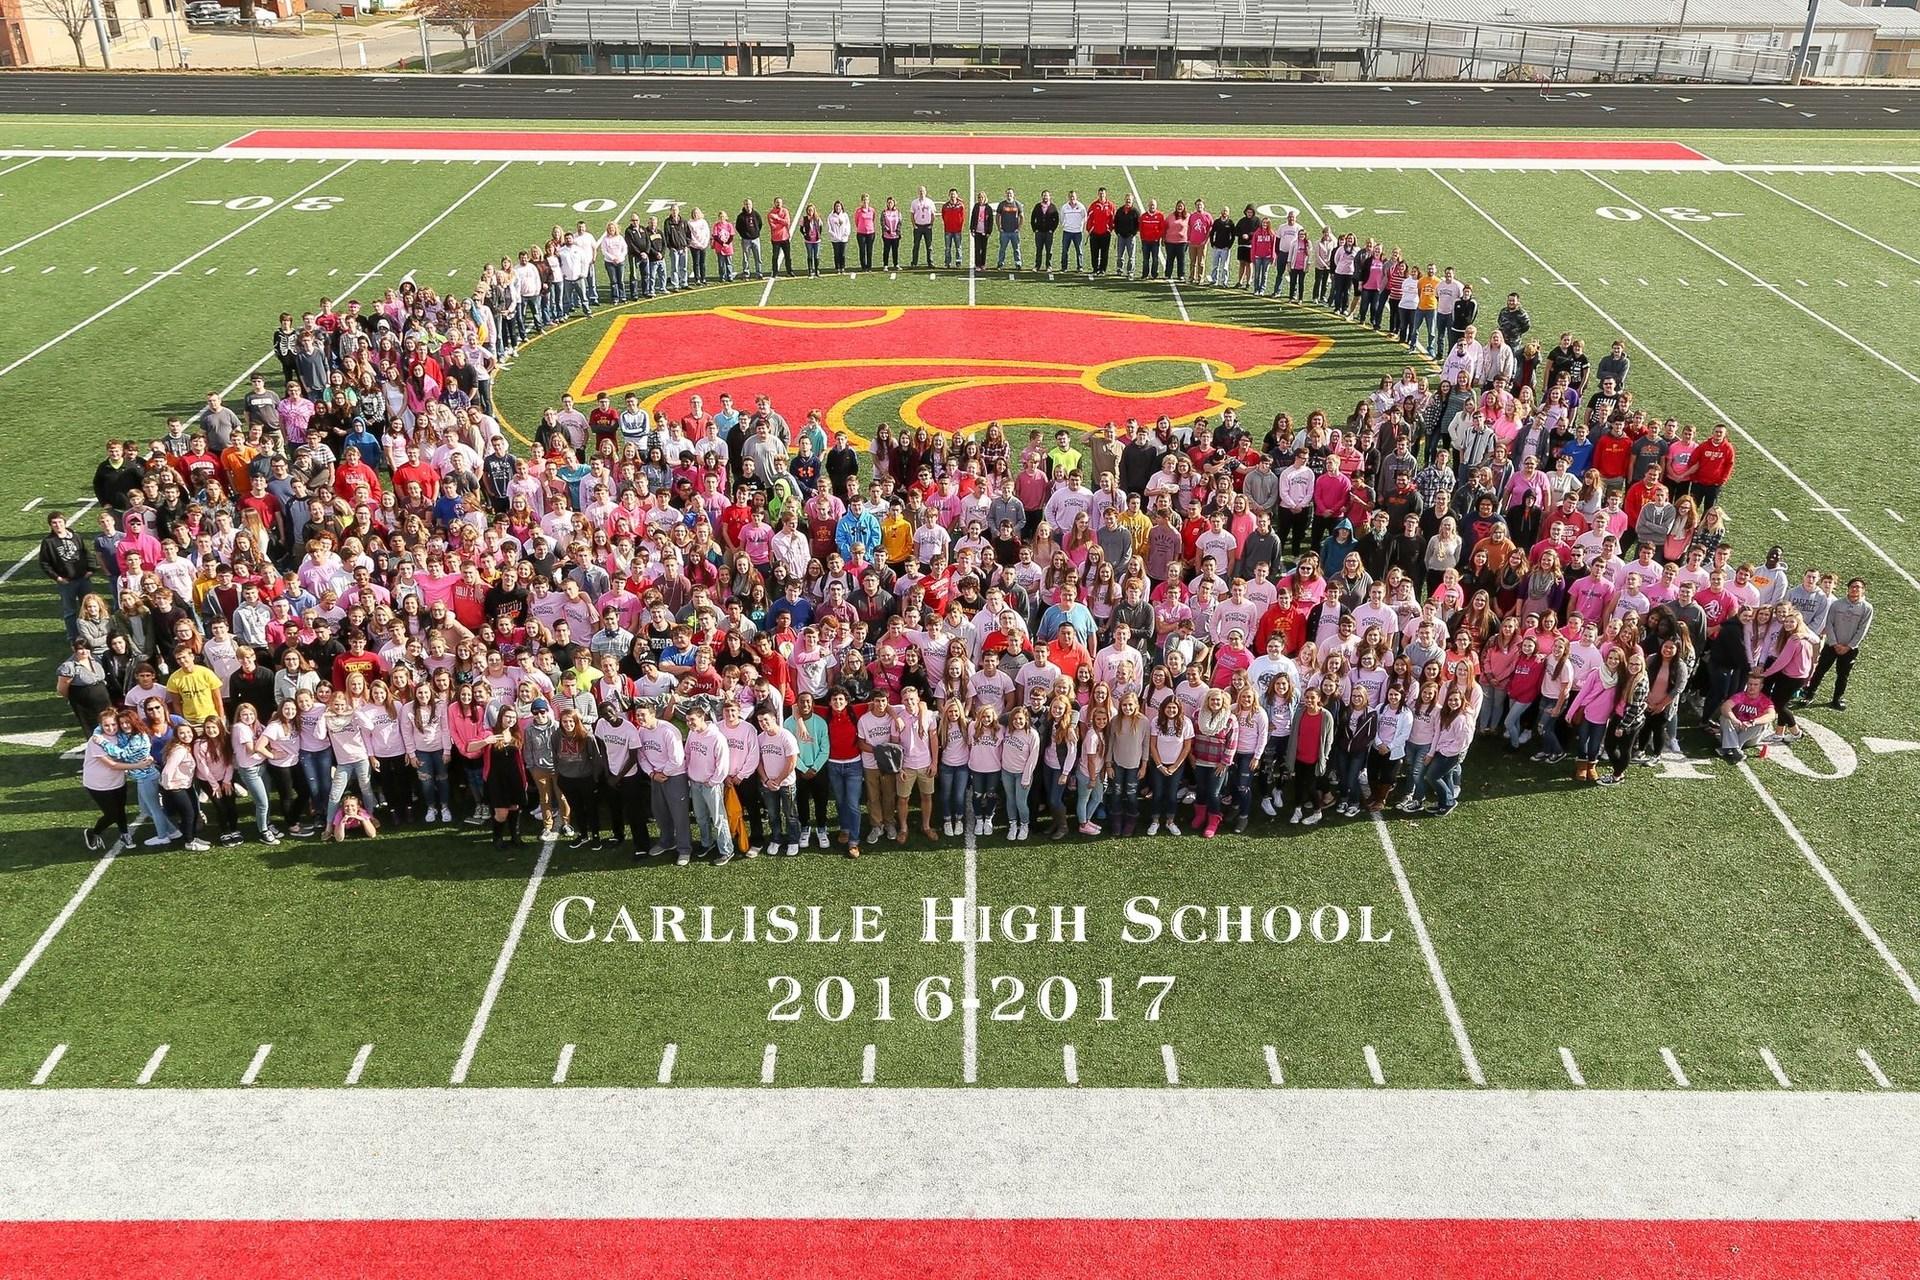 All School Photo 16-17